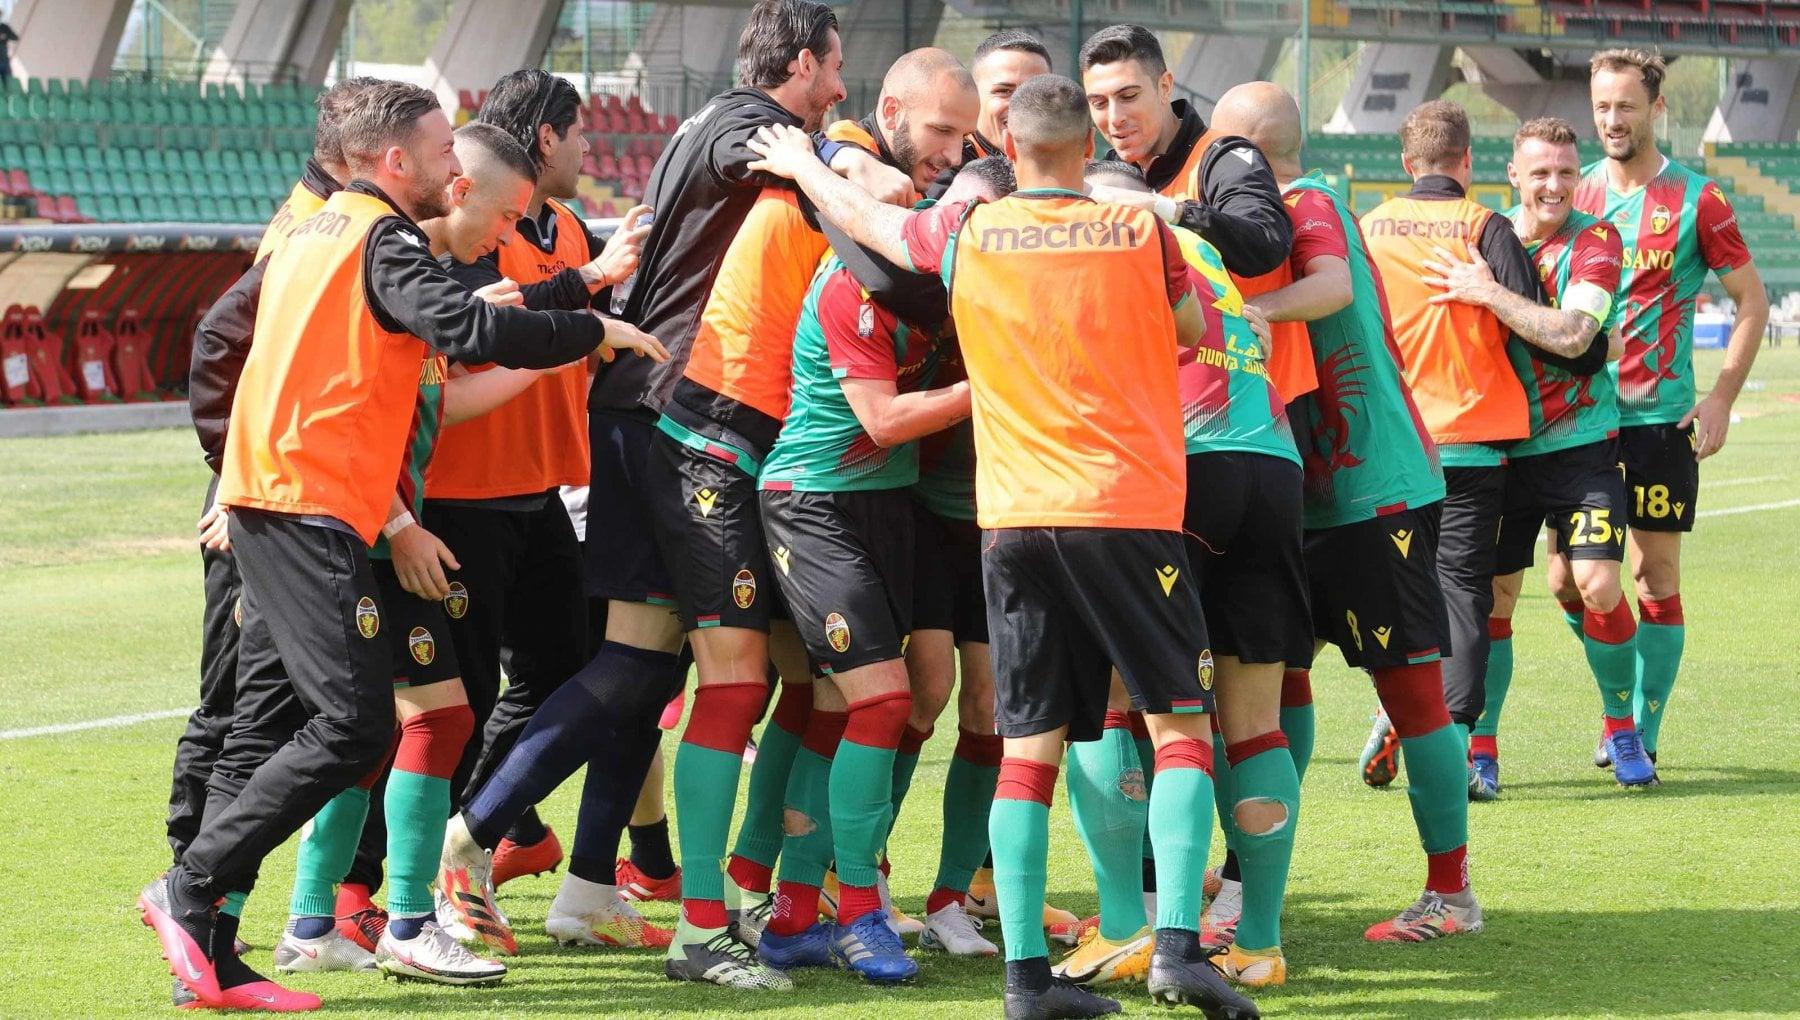 Serie C, una Ternana da record torna in B dopo tre anni